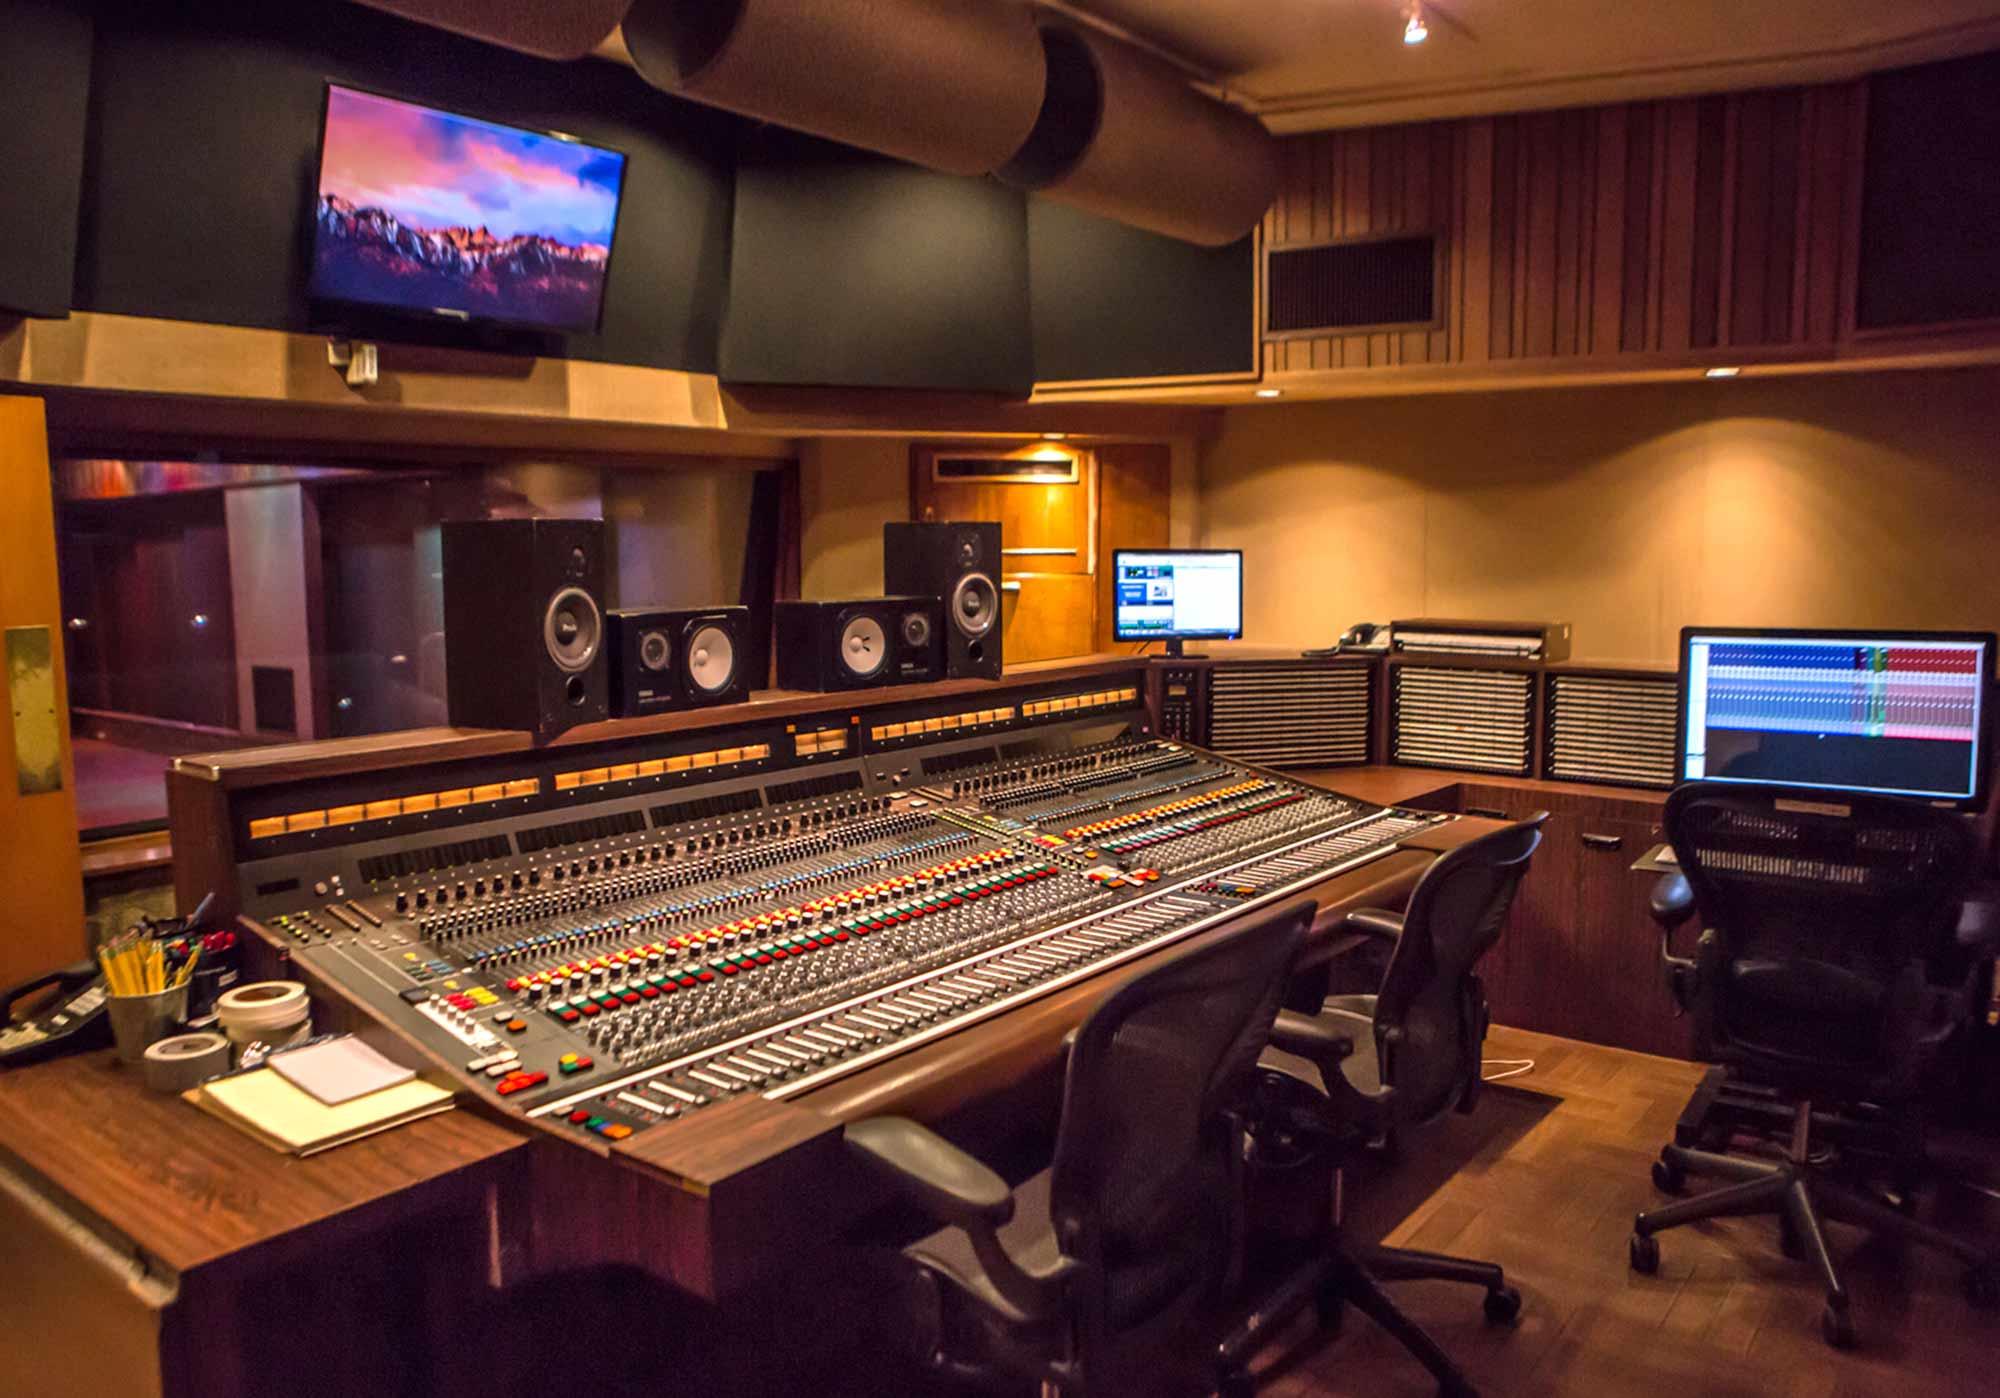 sunset_studios_control_room_1